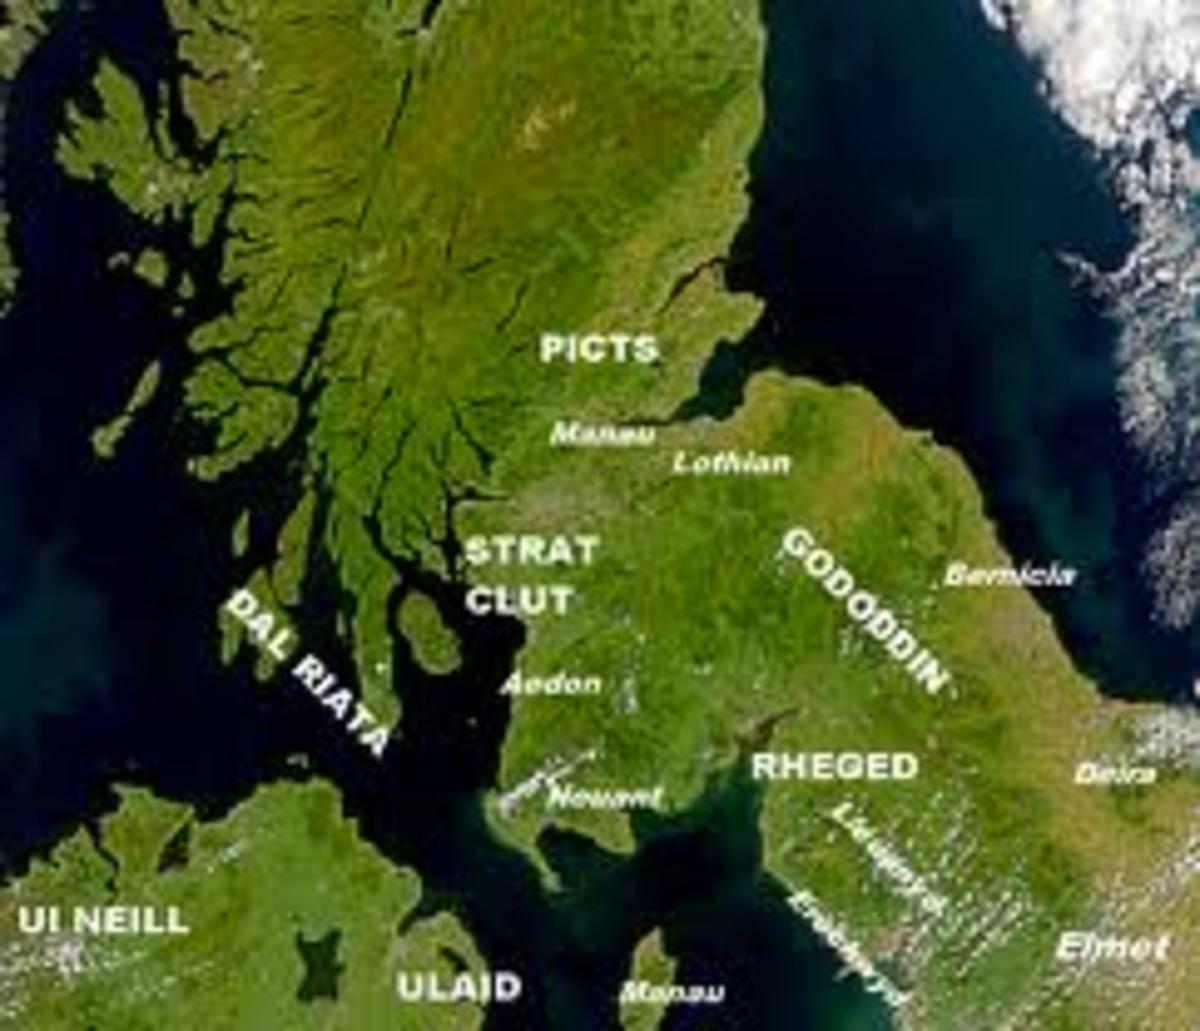 The Lost Kingdom of Pictland: Scotland's Forgotten Legacy